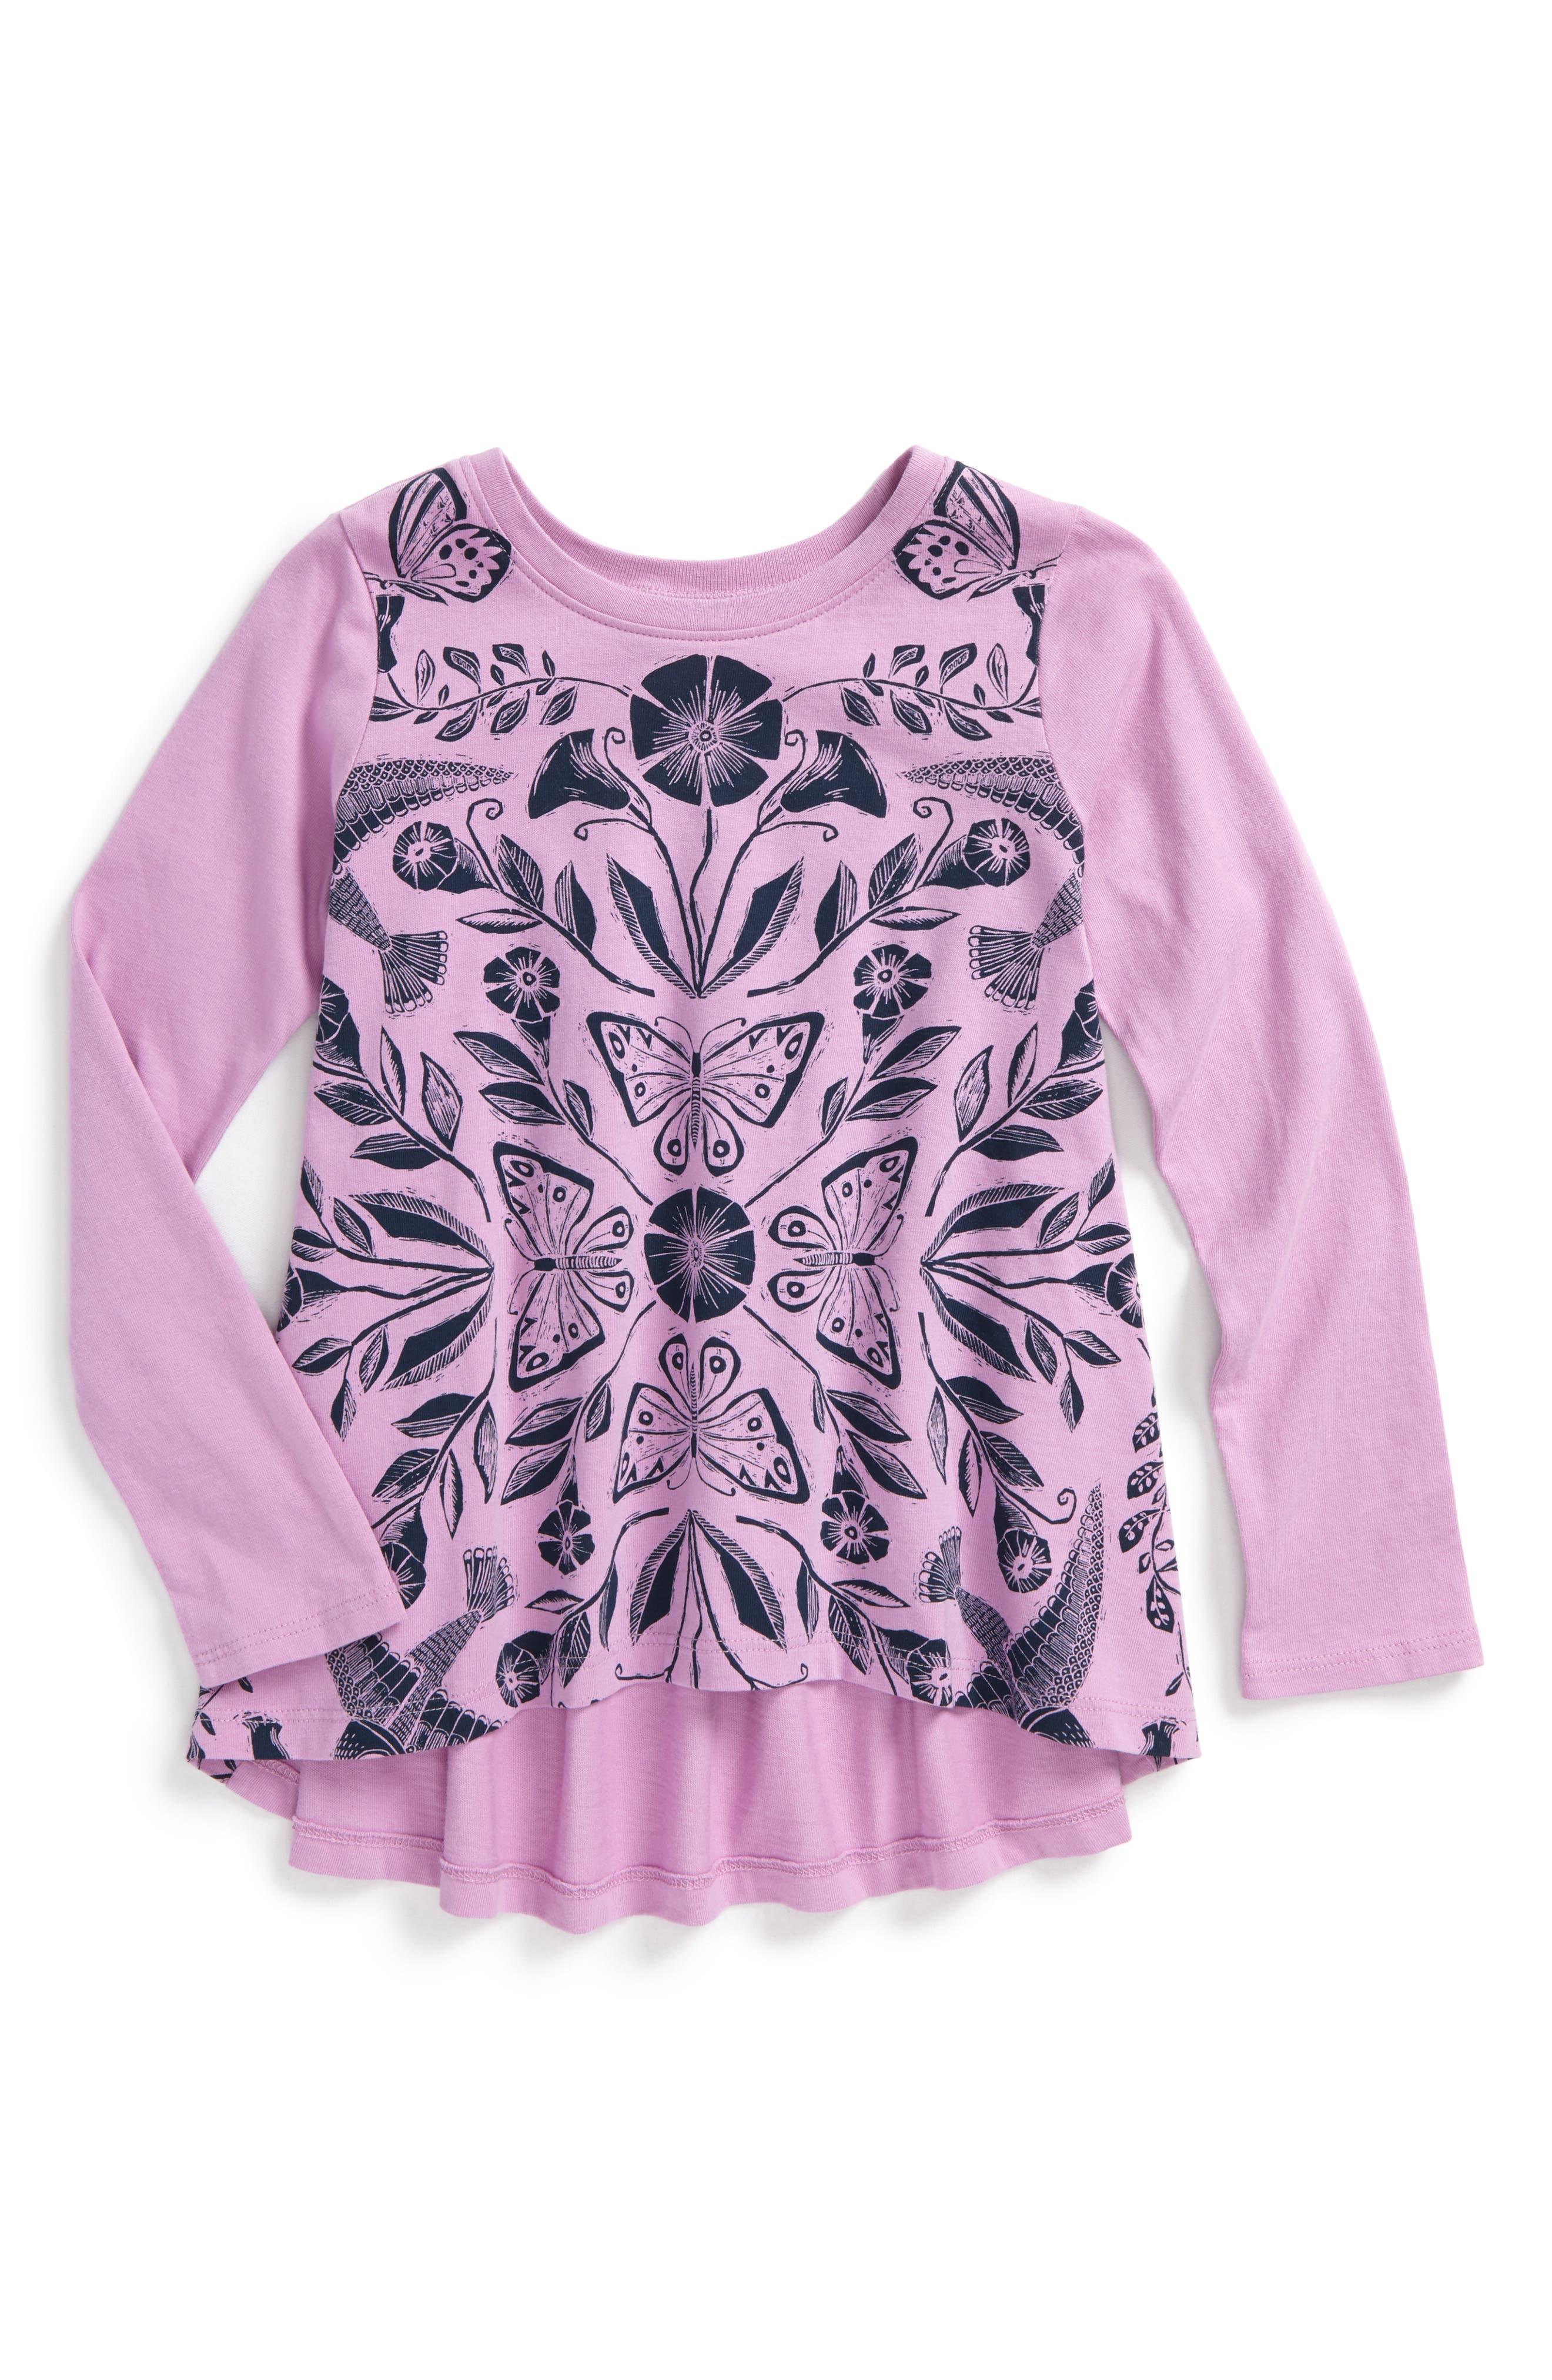 Alternate Image 1 Selected - Tea Collection Marsh Violet Twirl Top (Toddler Girls, Little Girls & Big Girls)